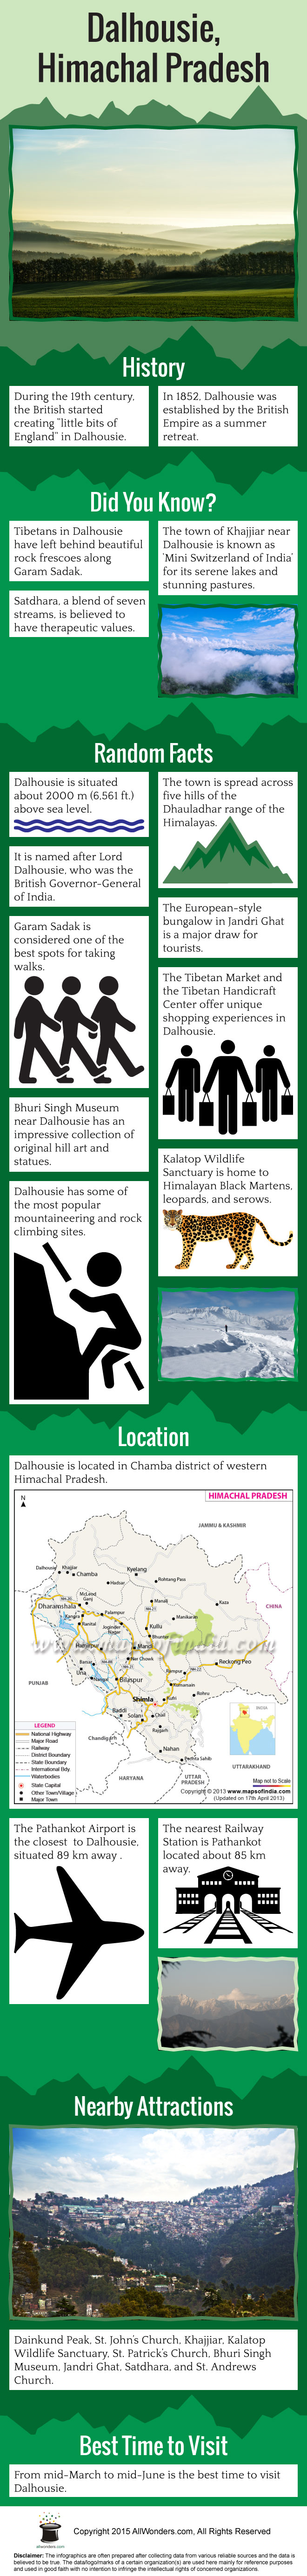 Dalhousie Infographic